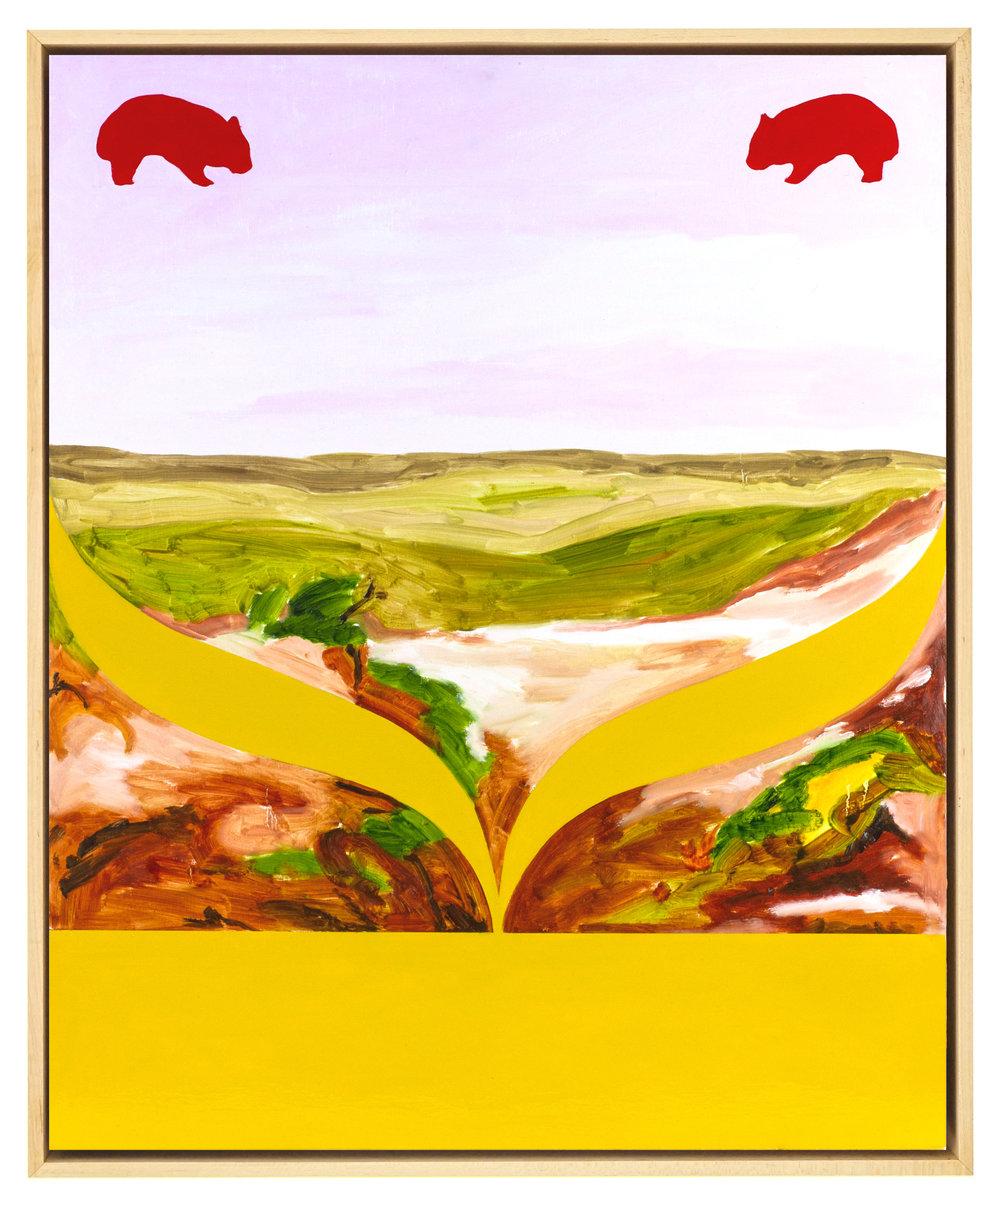 Untitled  2017  Oil, enamel and acrylic on plywood  60 x 75 cm